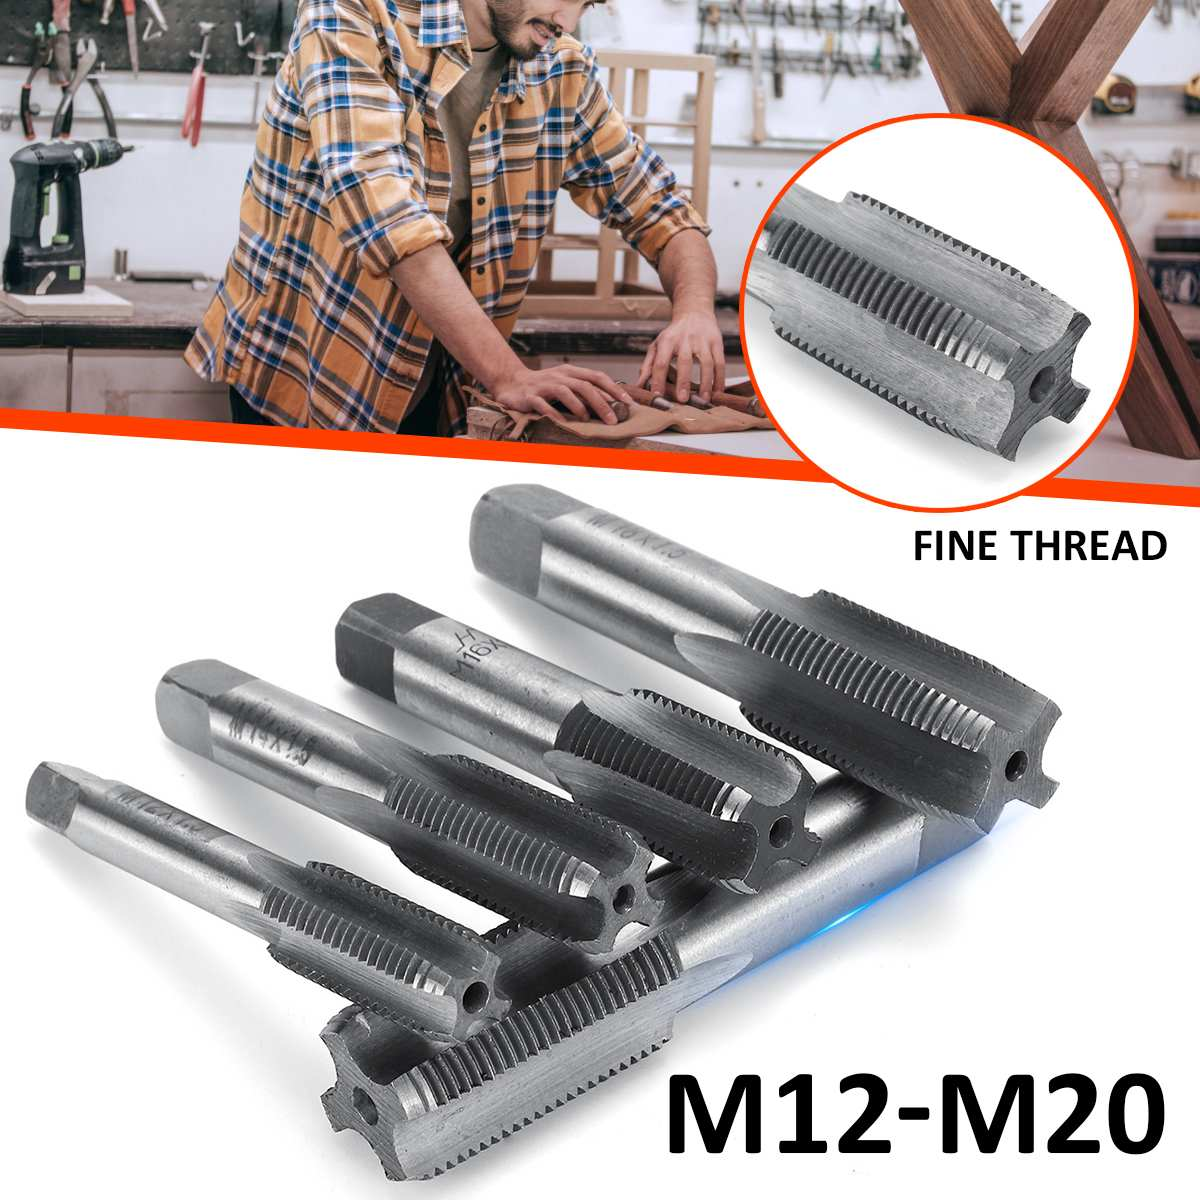 Half Thick M14-1.5 or 14mm Metric FINE Left Hand Thread Hex Jam 10 Thin Nut